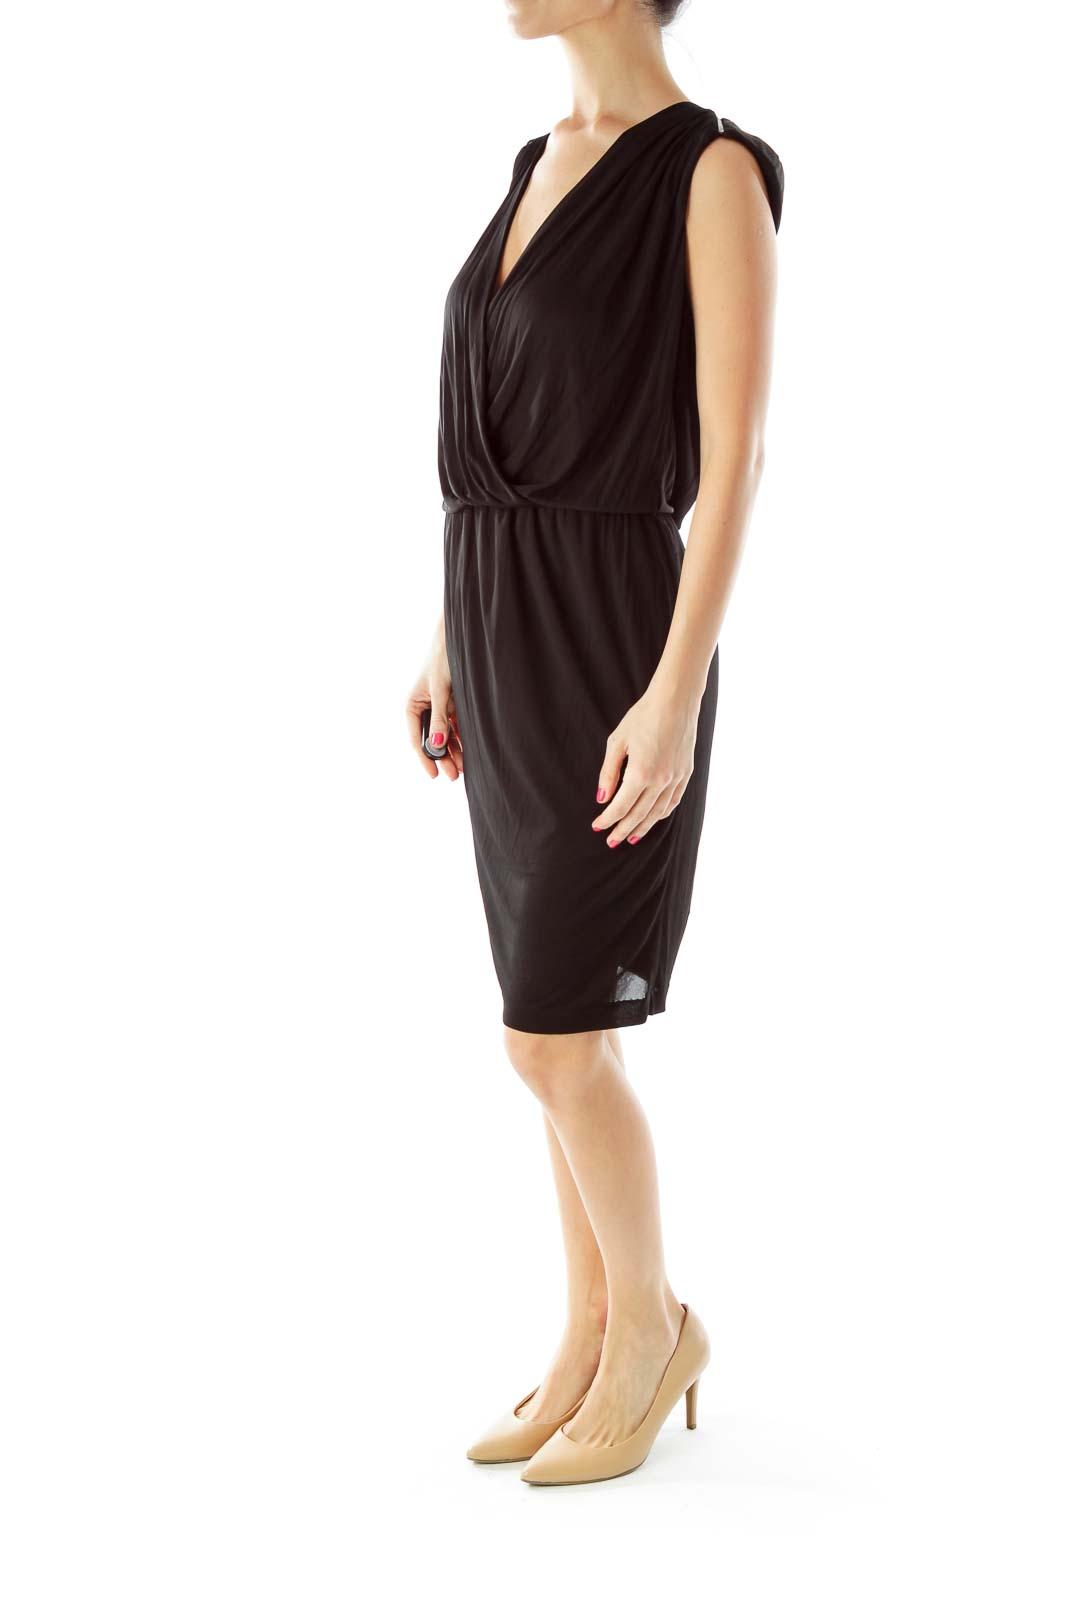 Black Zippered Cocktail Dress